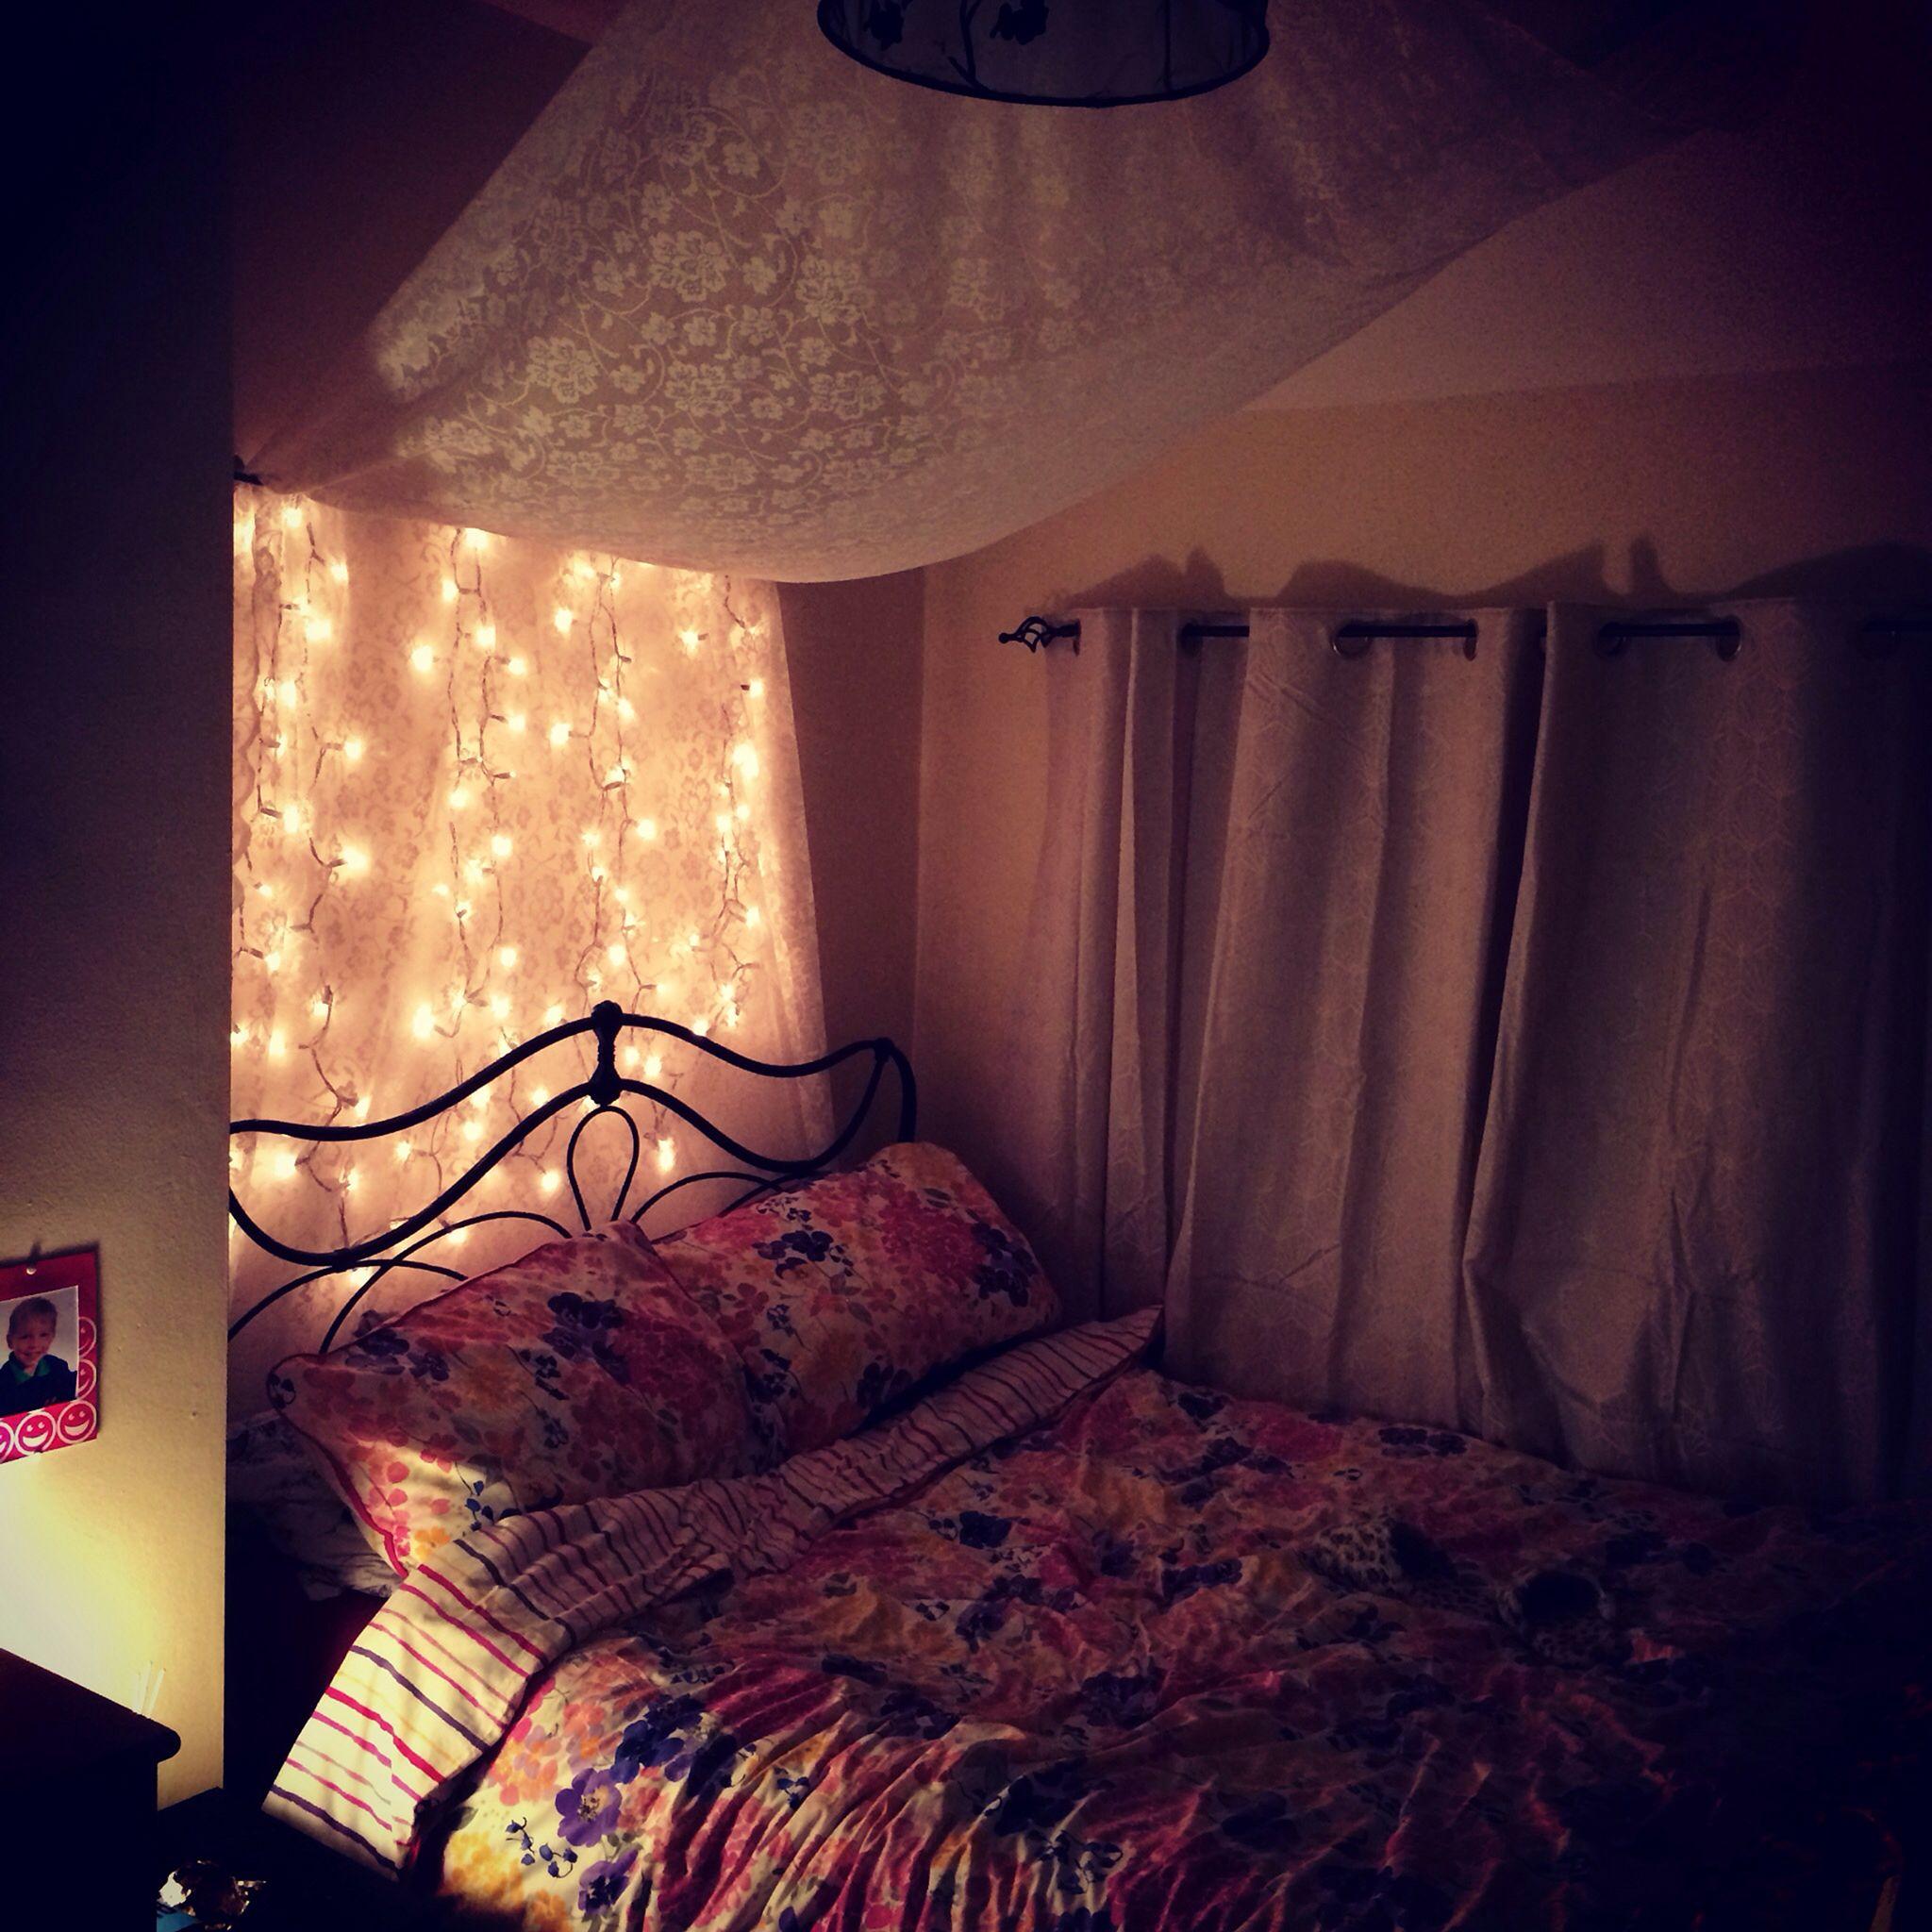 Romantic Bedroom Lighting: Bedroom With Fairy Lights Ideas